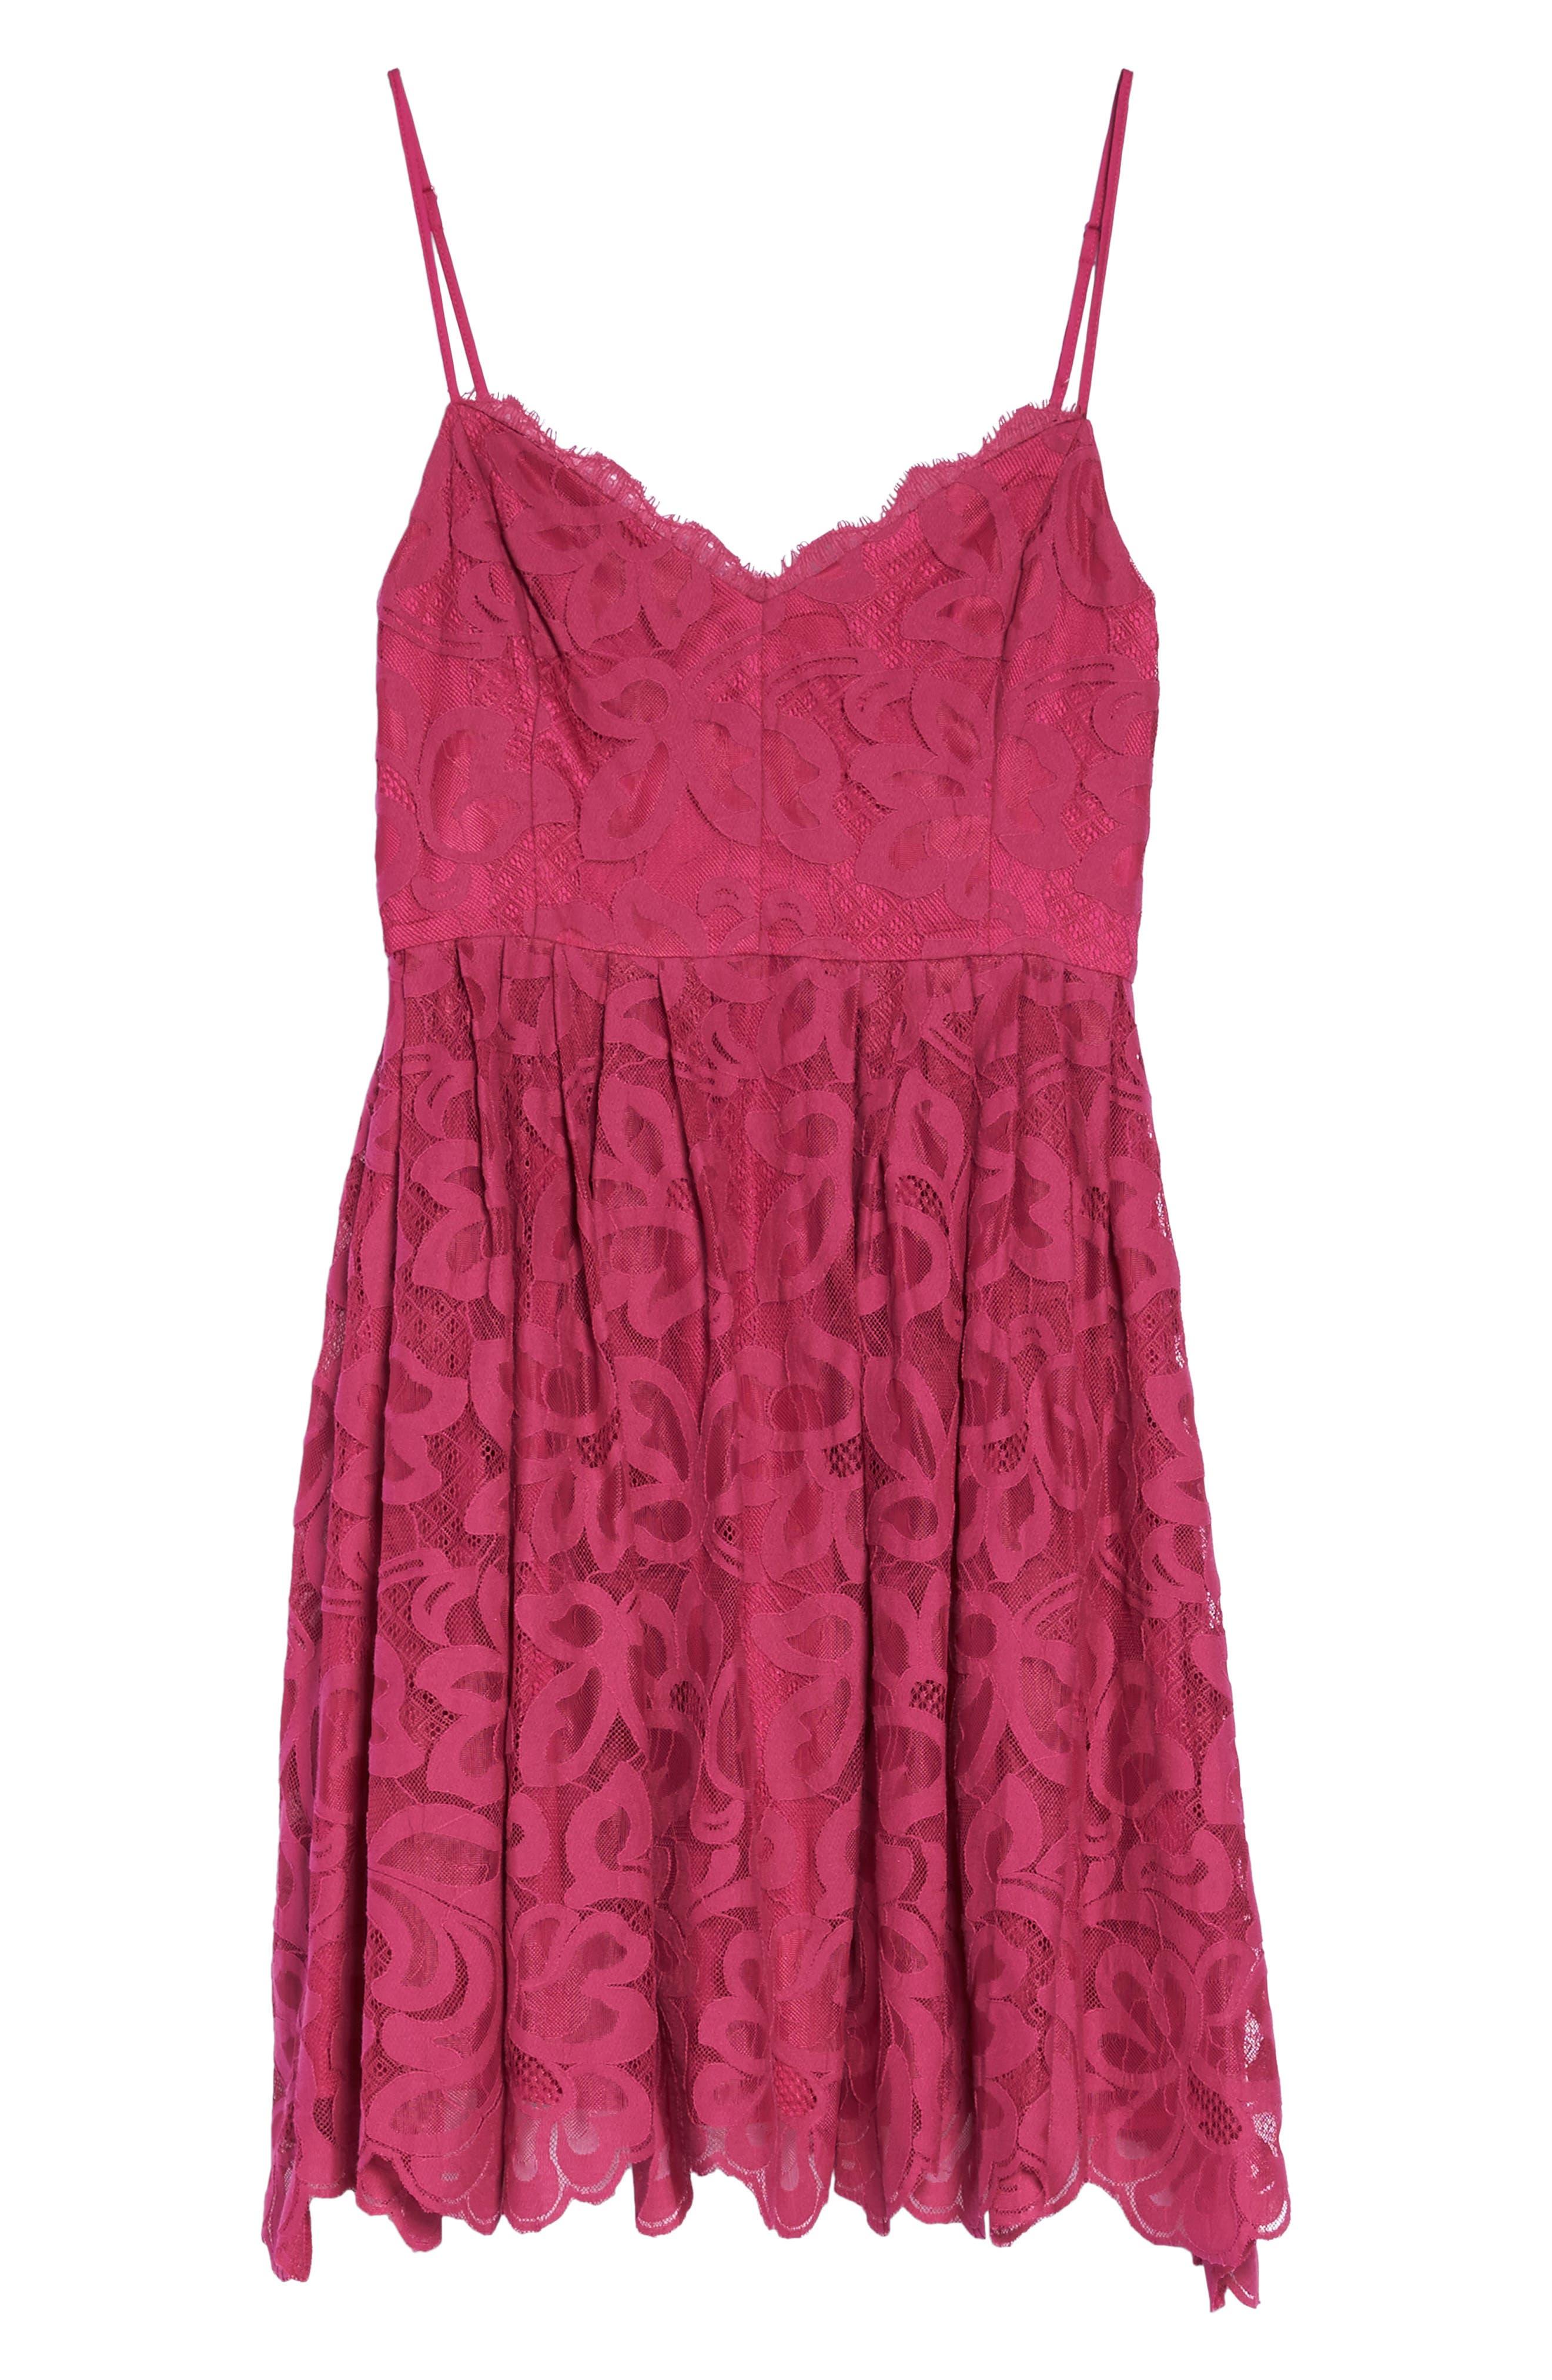 Celeste Scalloped Lace Fit & Flare Dress,                             Alternate thumbnail 6, color,